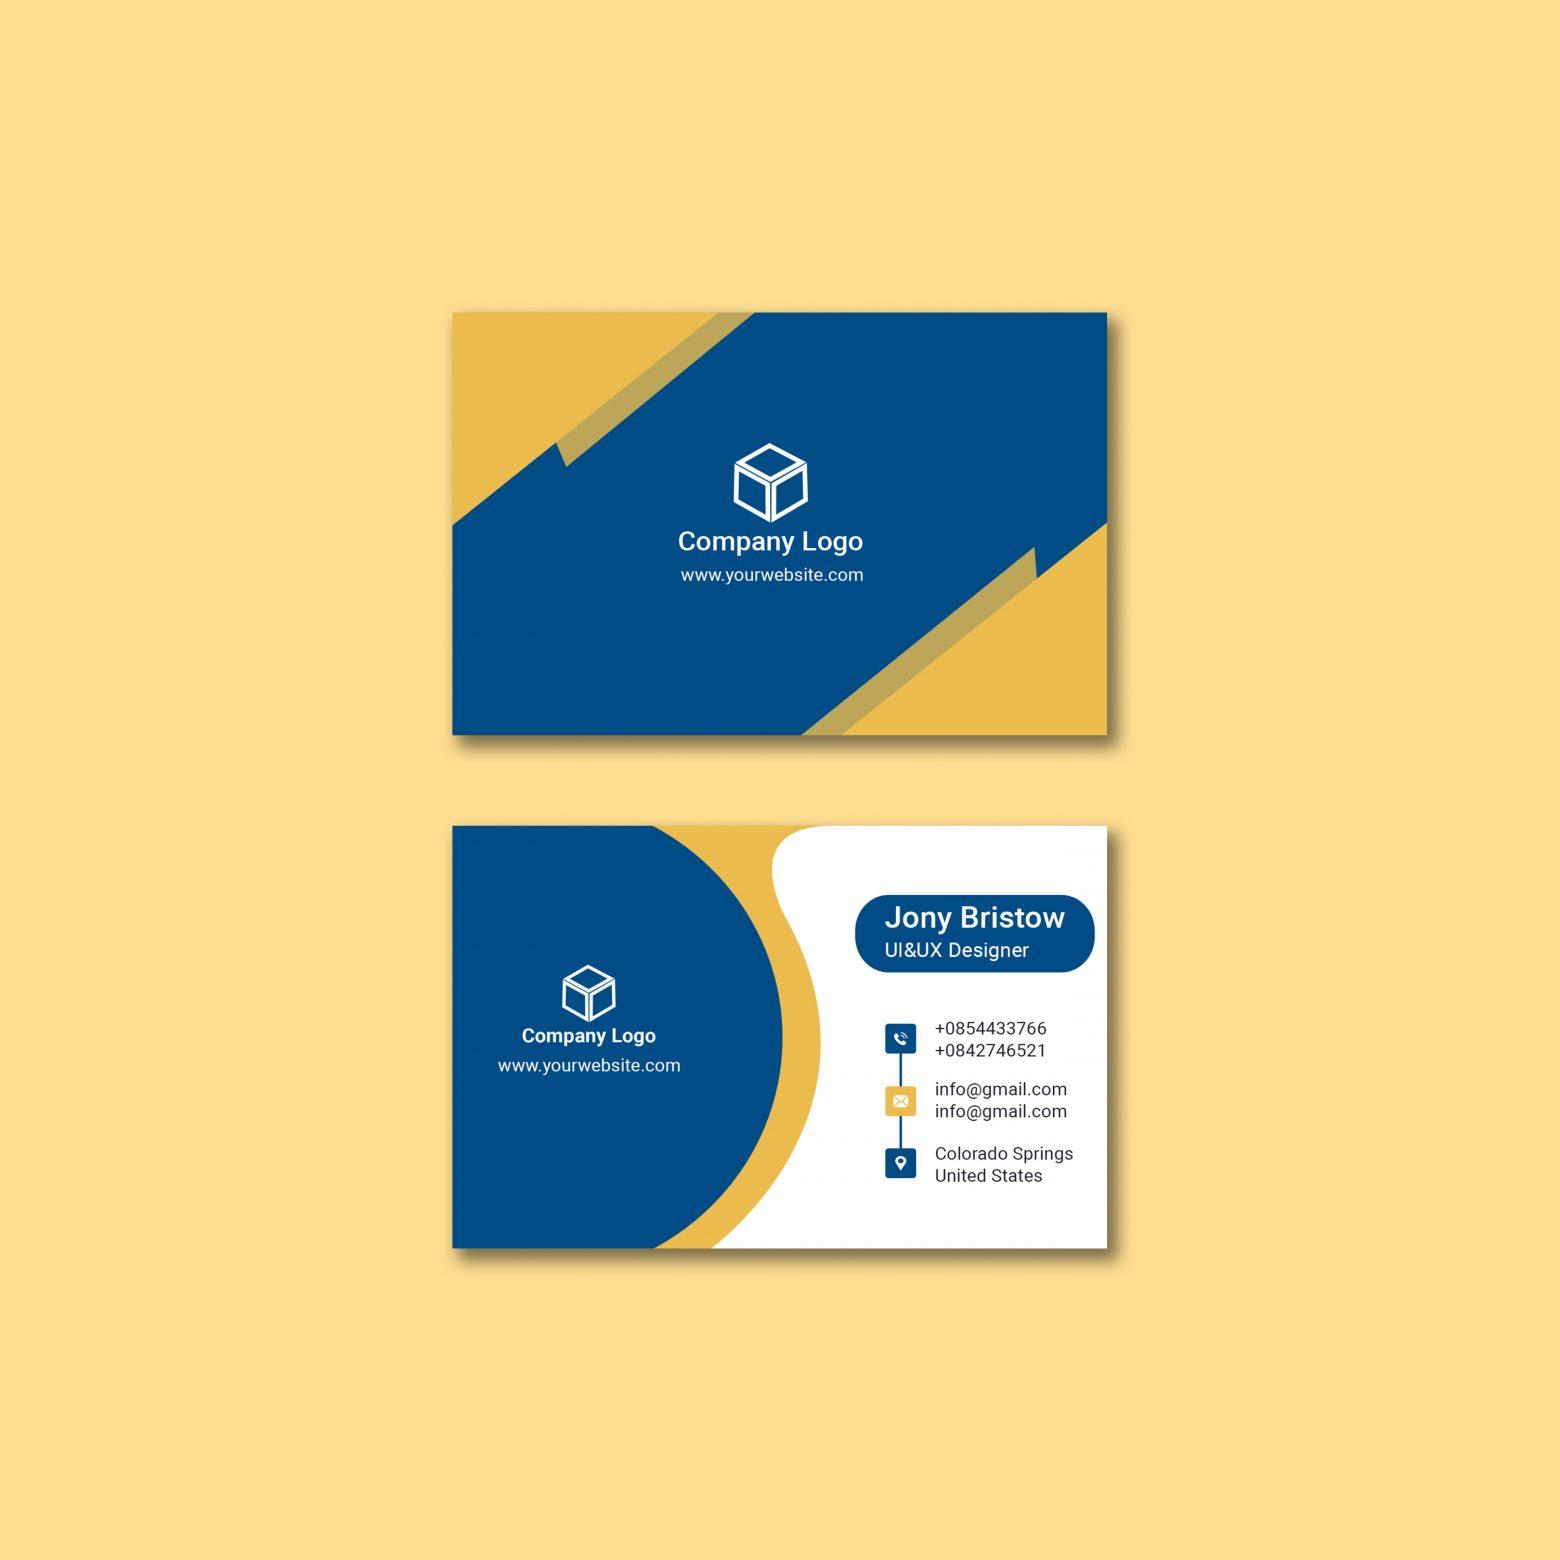 3091634 1560x1560 - کارت ویزیت شرکتی رایگان لایه باز